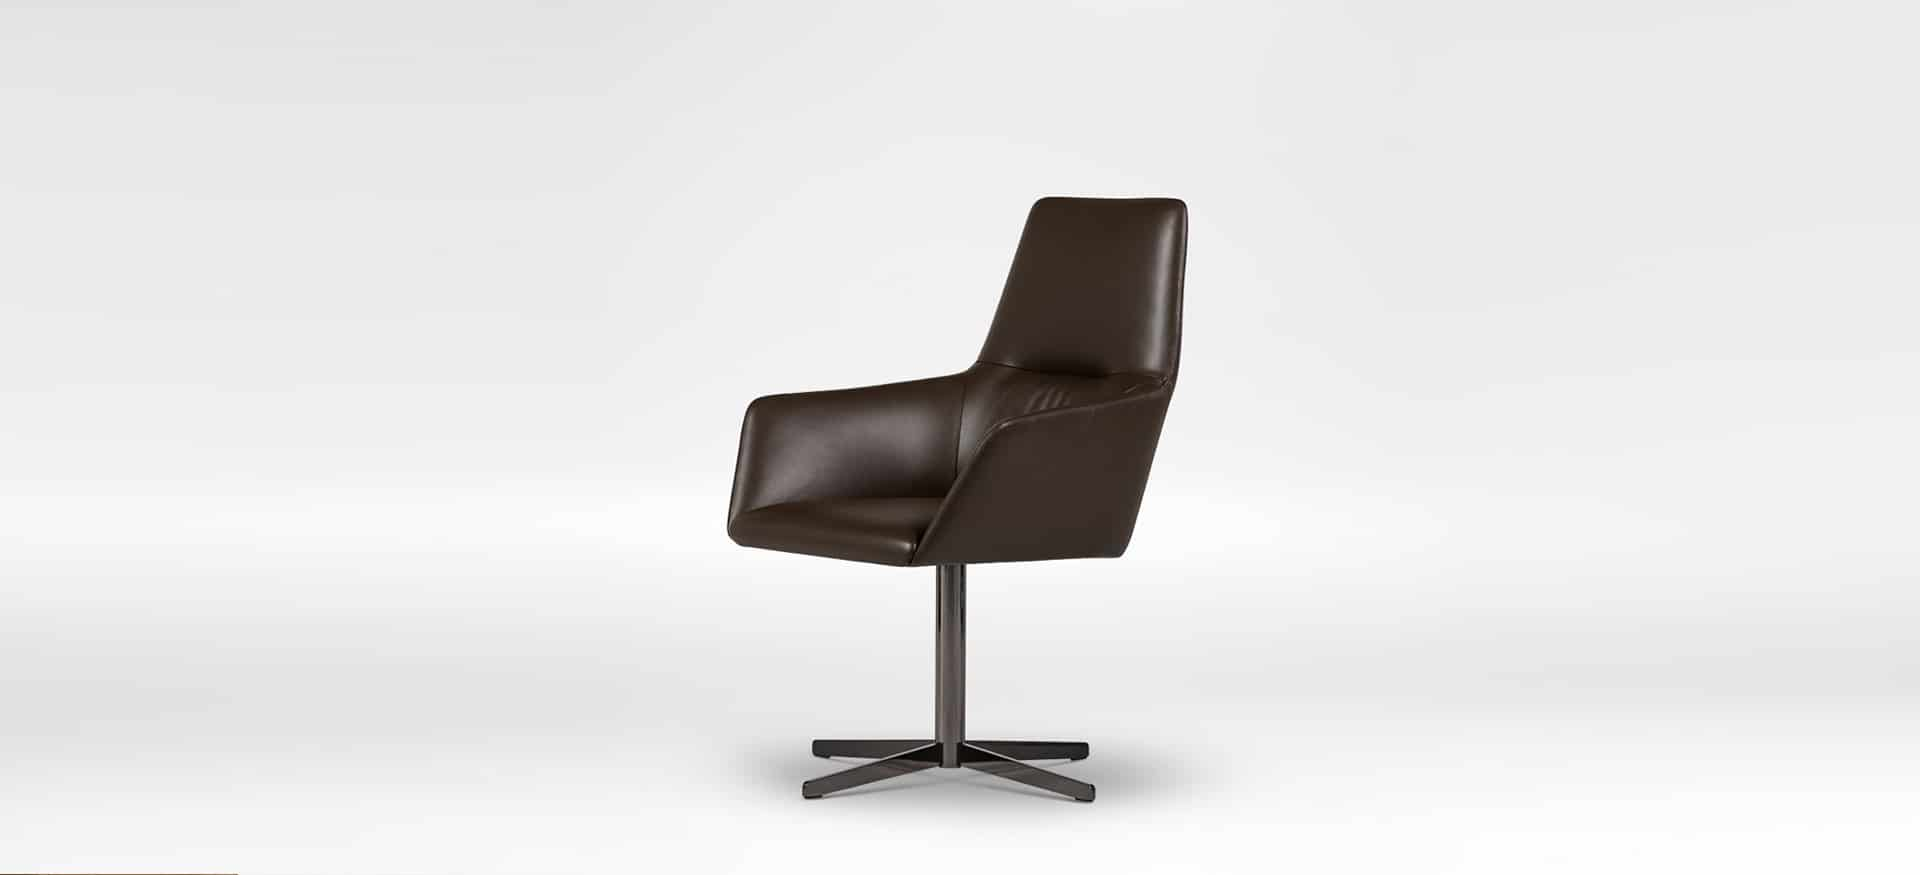 Qing Desk Chair